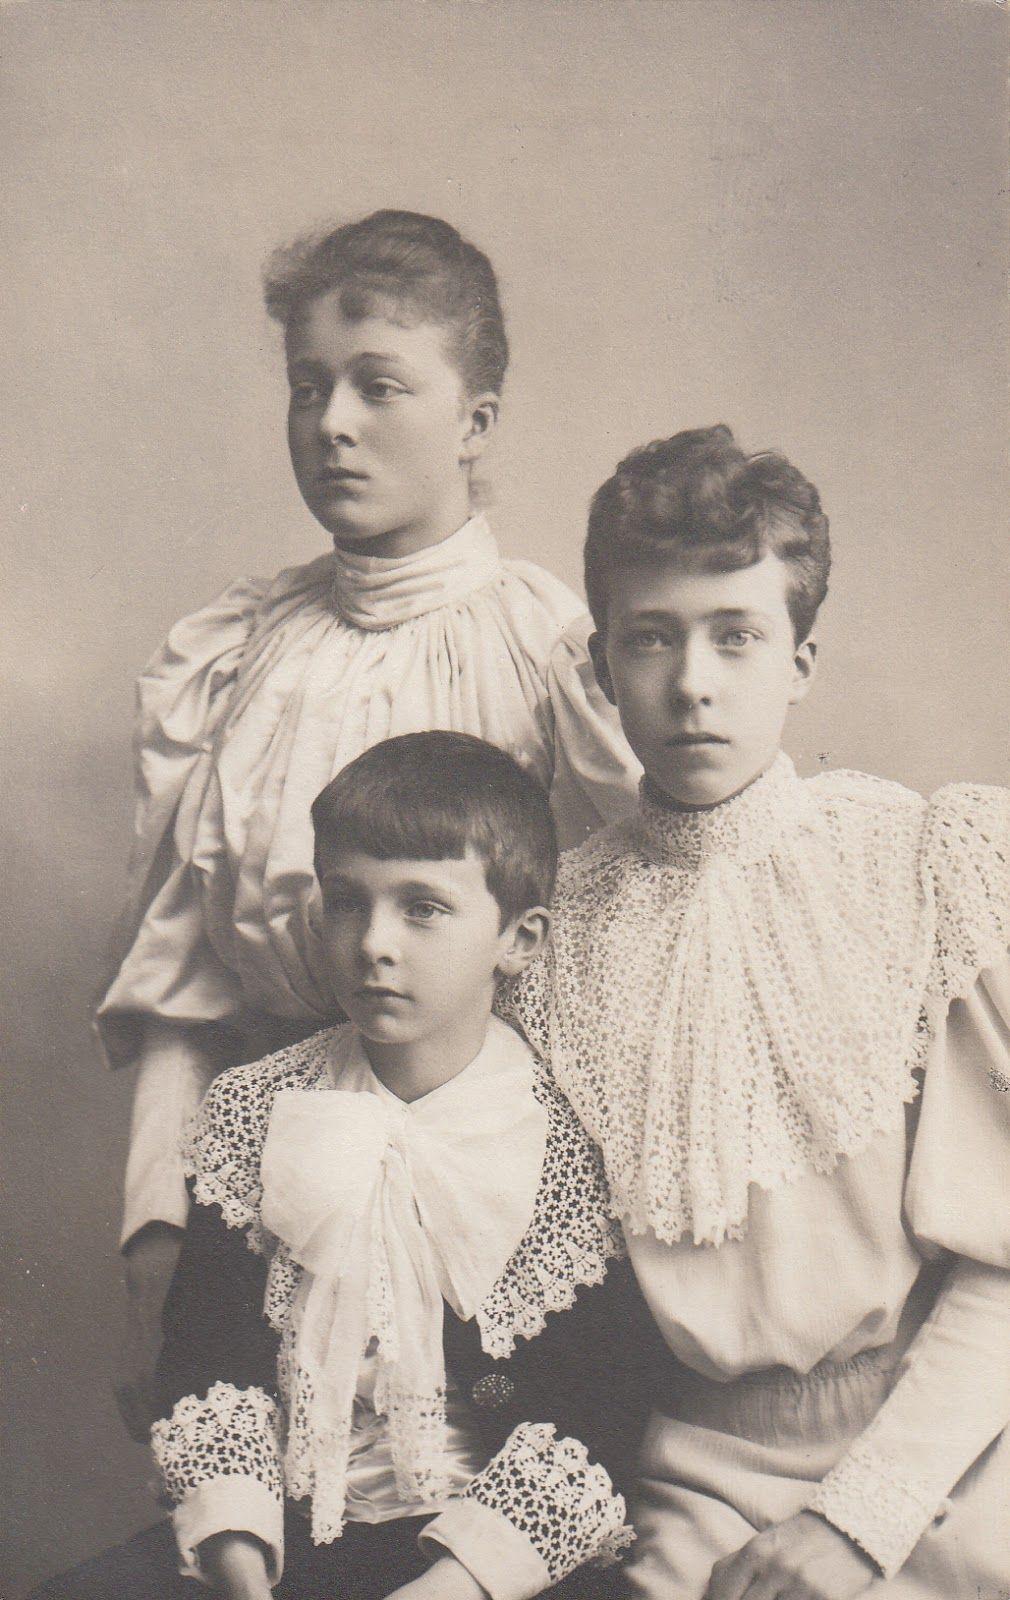 Edith Evans (1888?976) Edith Evans (1888?976) new pics